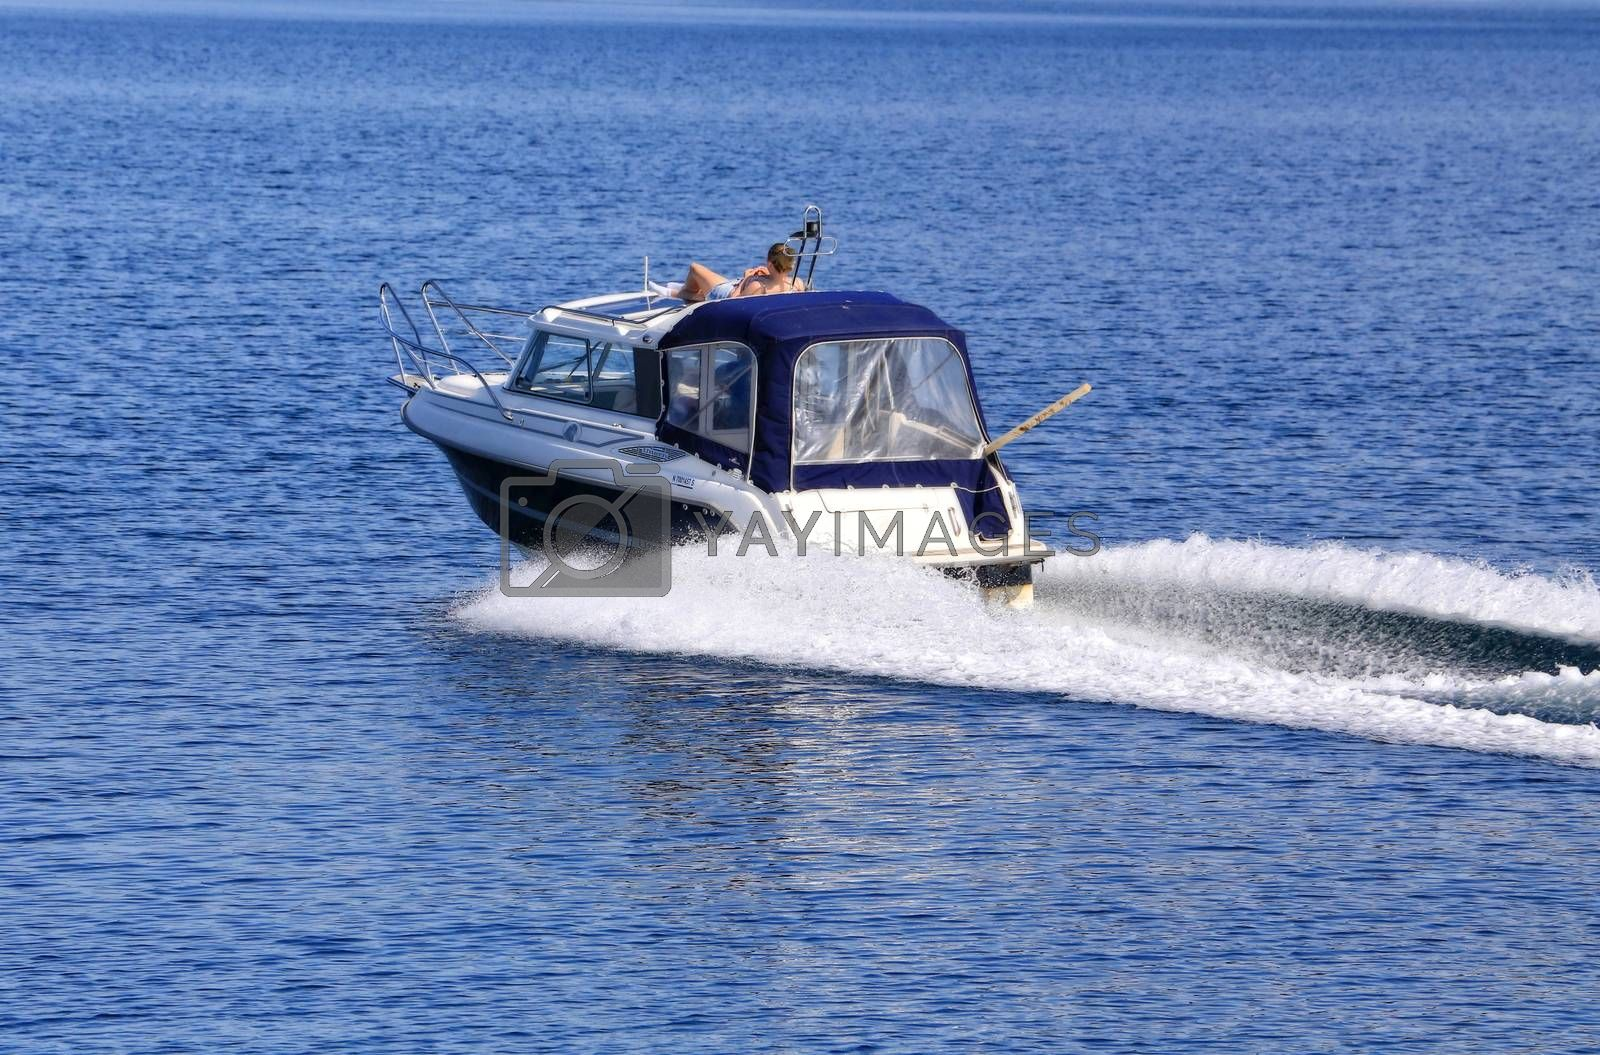 Fristidsbåt på sjøen i flott sommervær - Brønnøy- Nordland